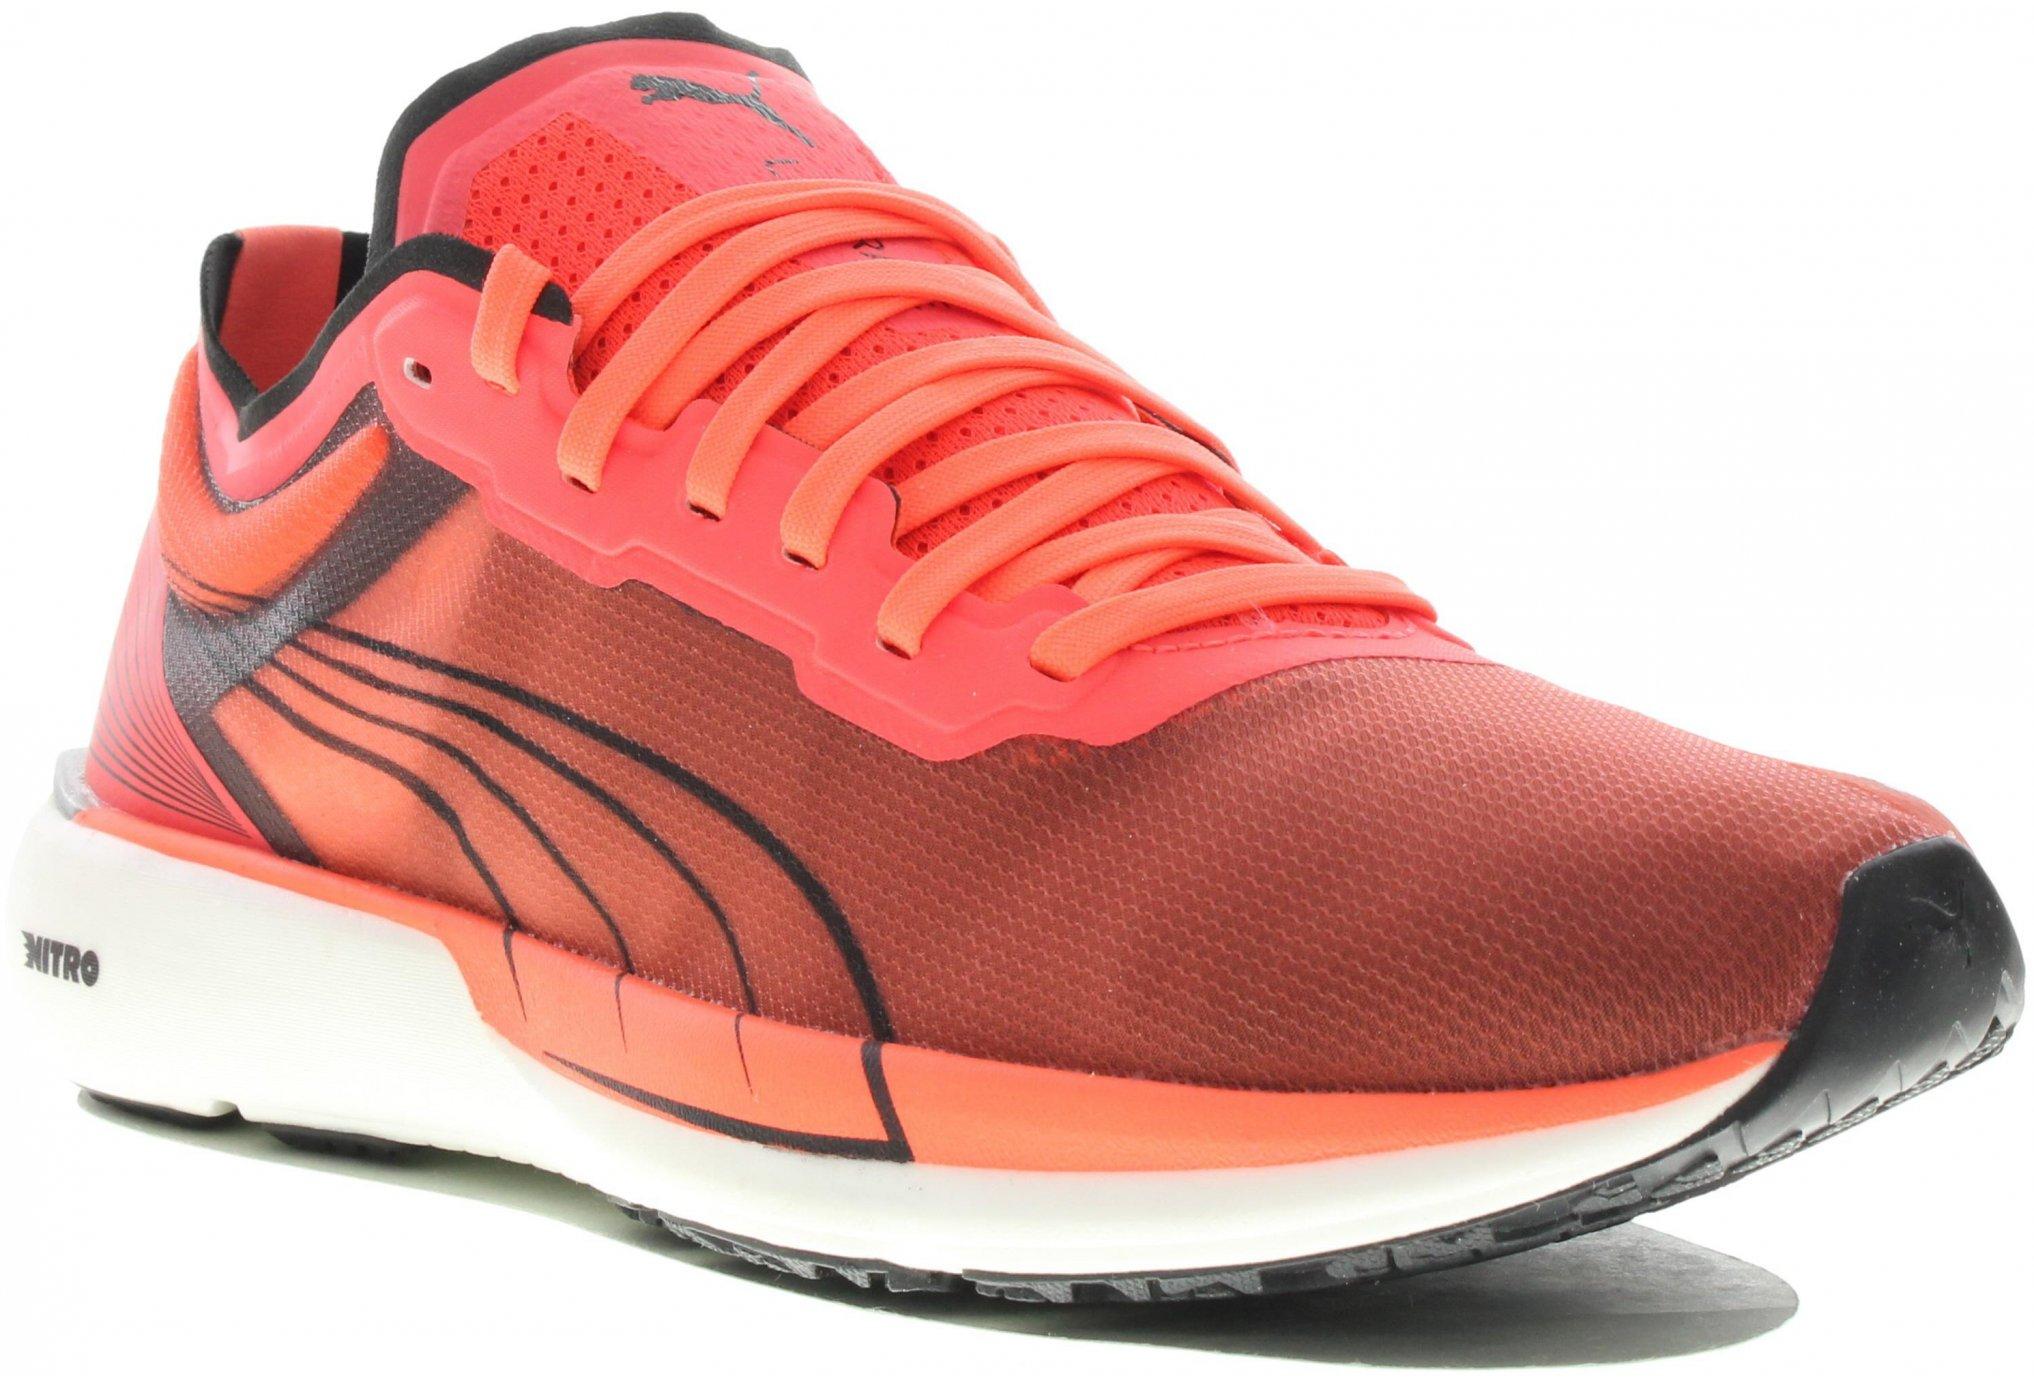 Puma Liberate Nitro W Chaussures running femme